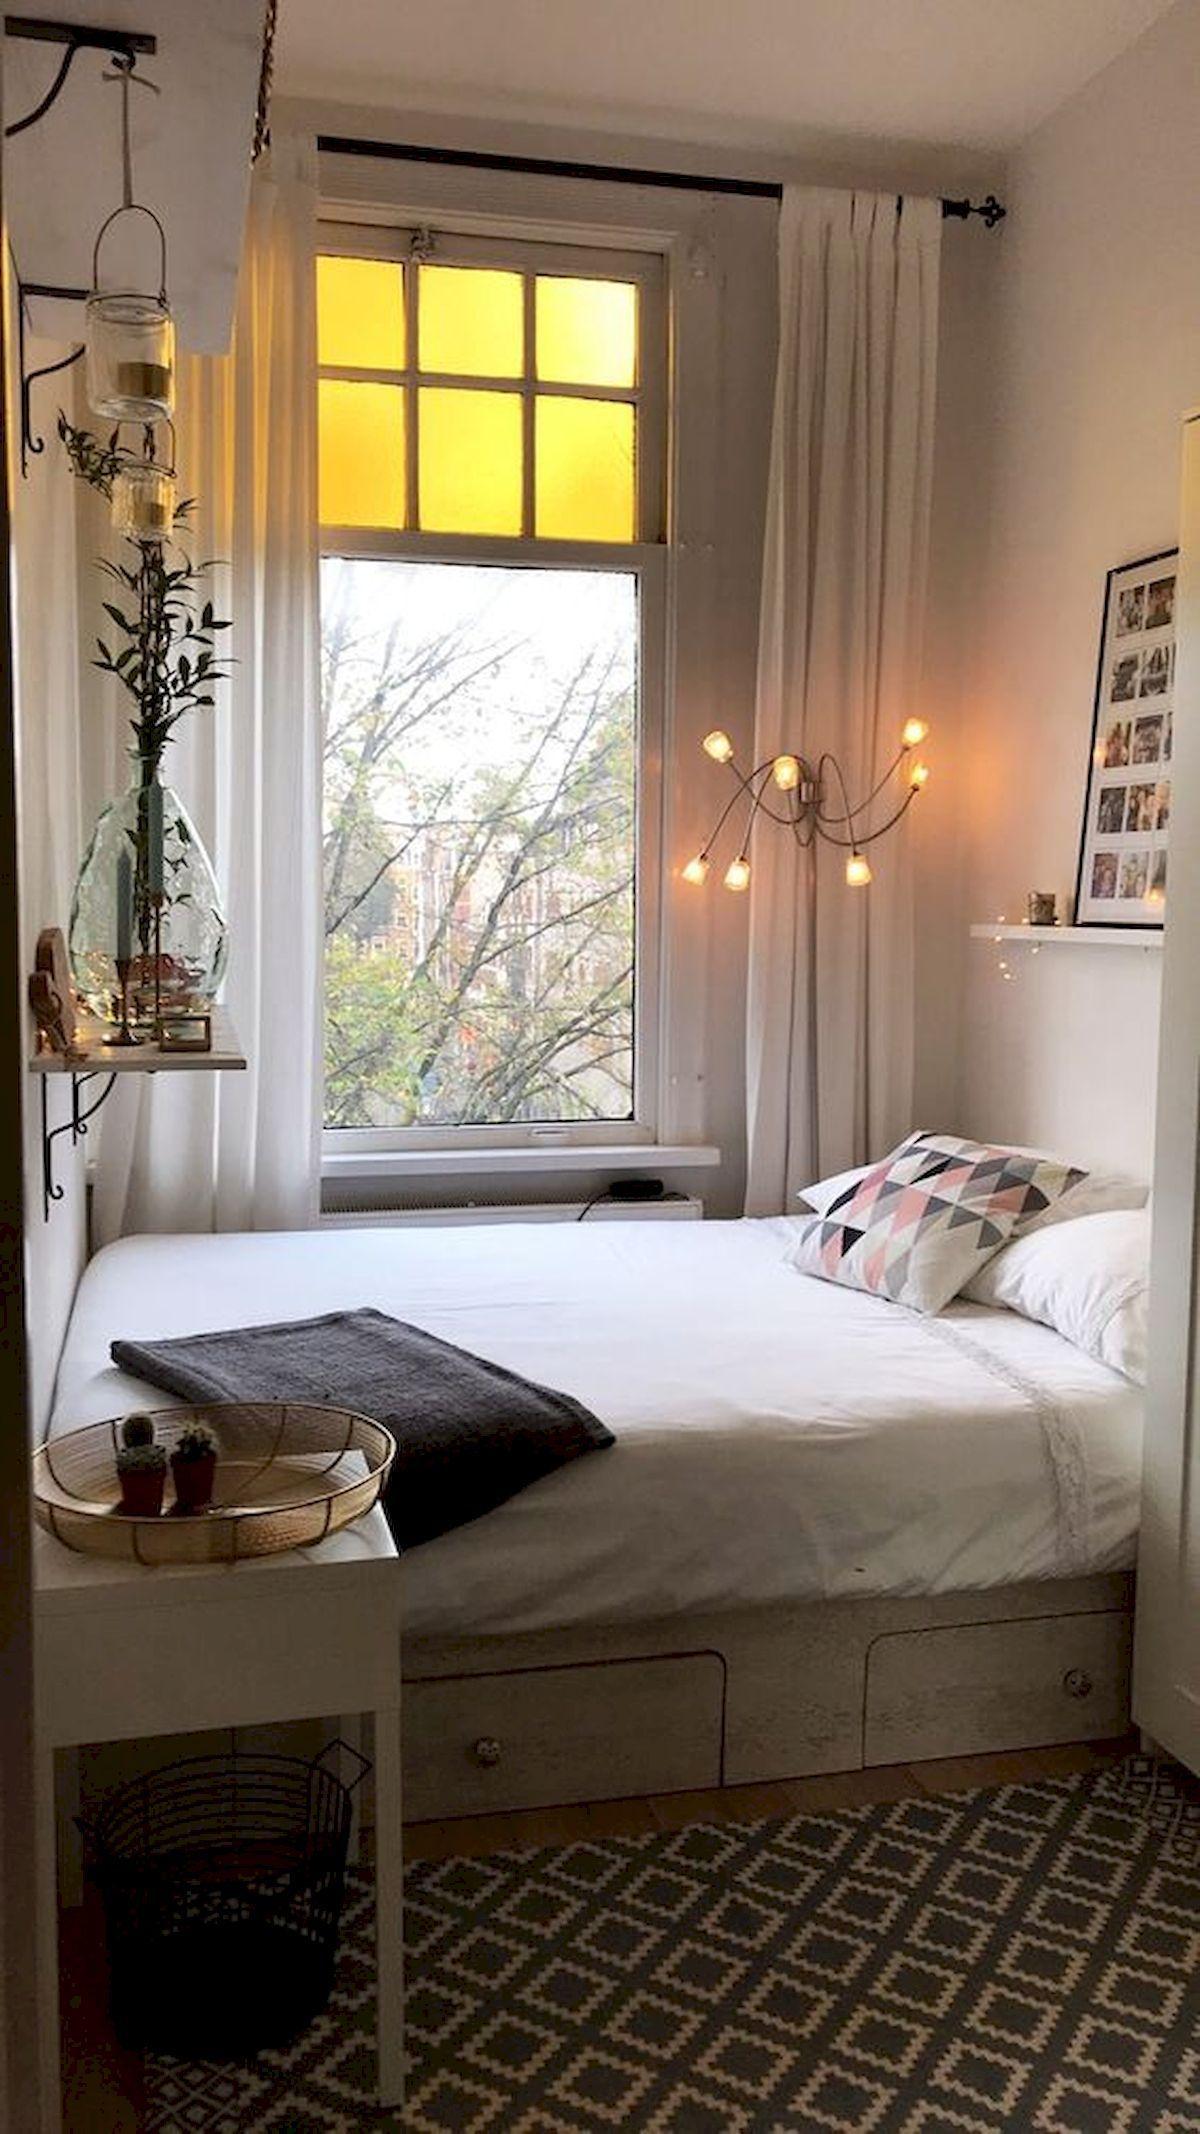 6bedroomdesign Apartment Bedroom Design Small Room Bedroom Small Room Design